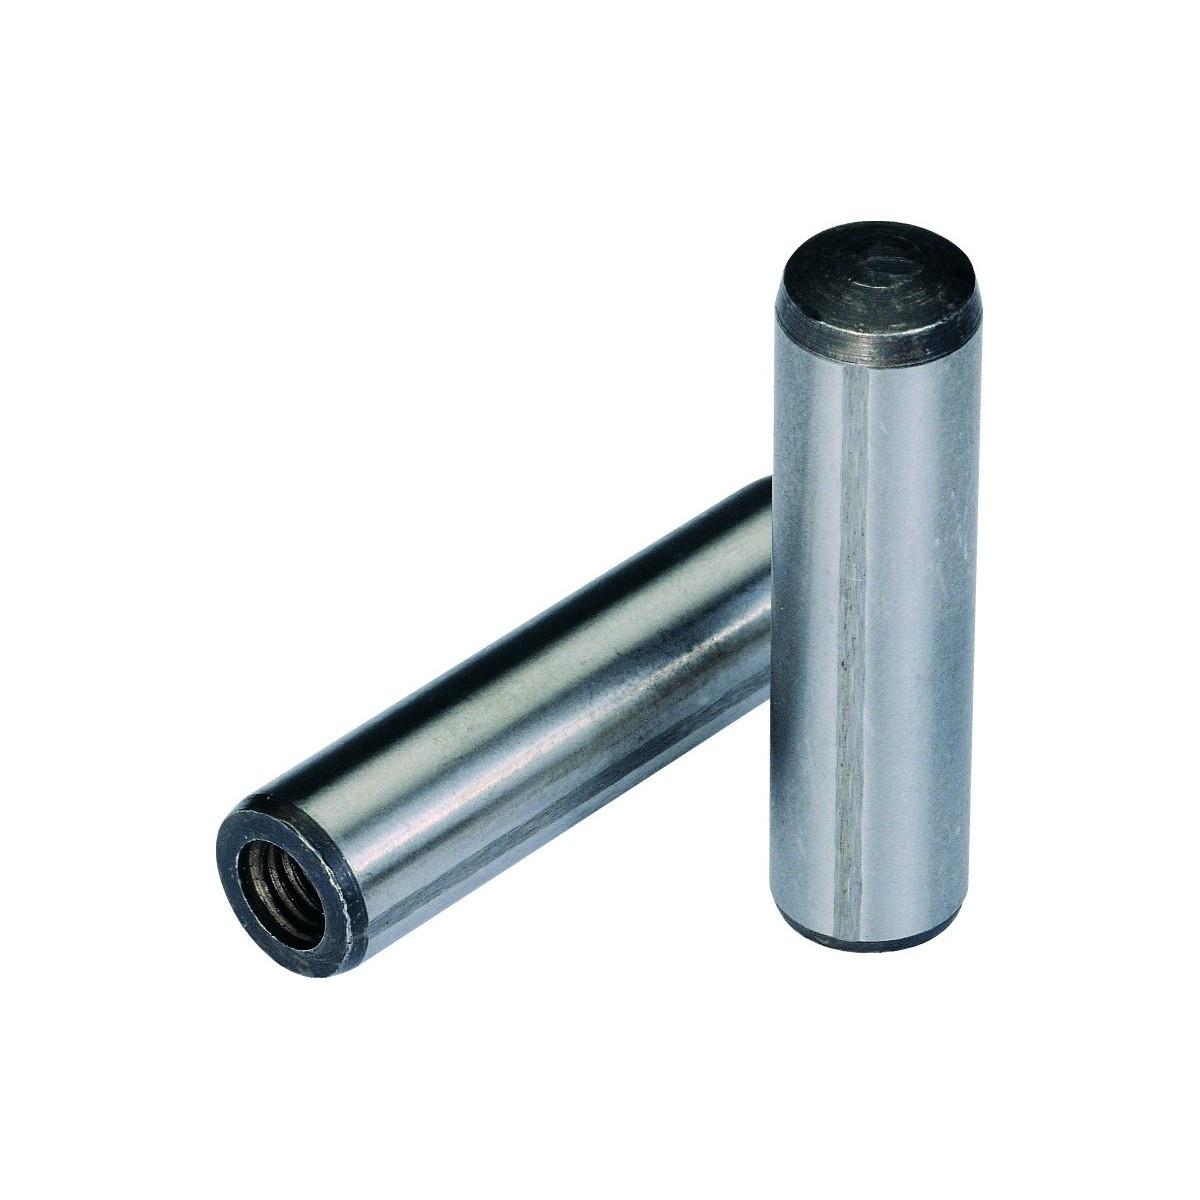 Штифт цилиндрический MMG  DIN 7979D M10 х 100 Класс 10.9 (Фосфат) 1 шт